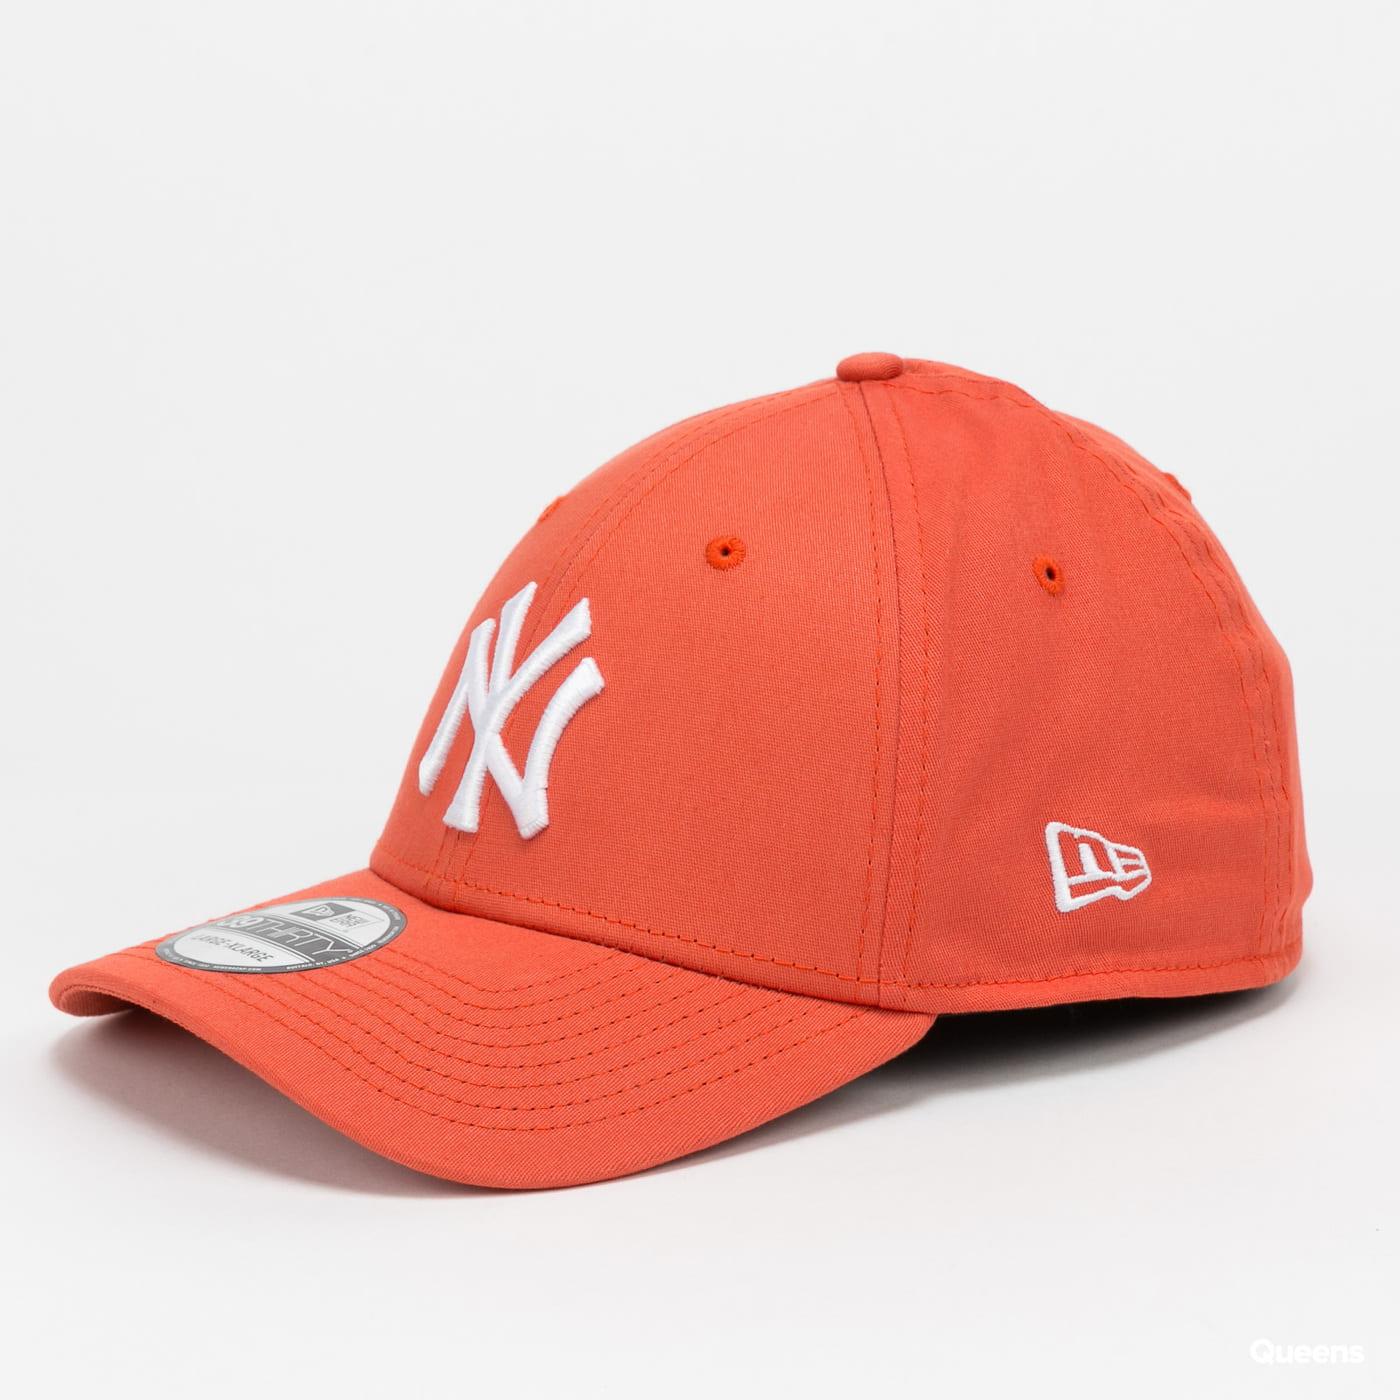 New Era 3930 MLB League essential NY orange